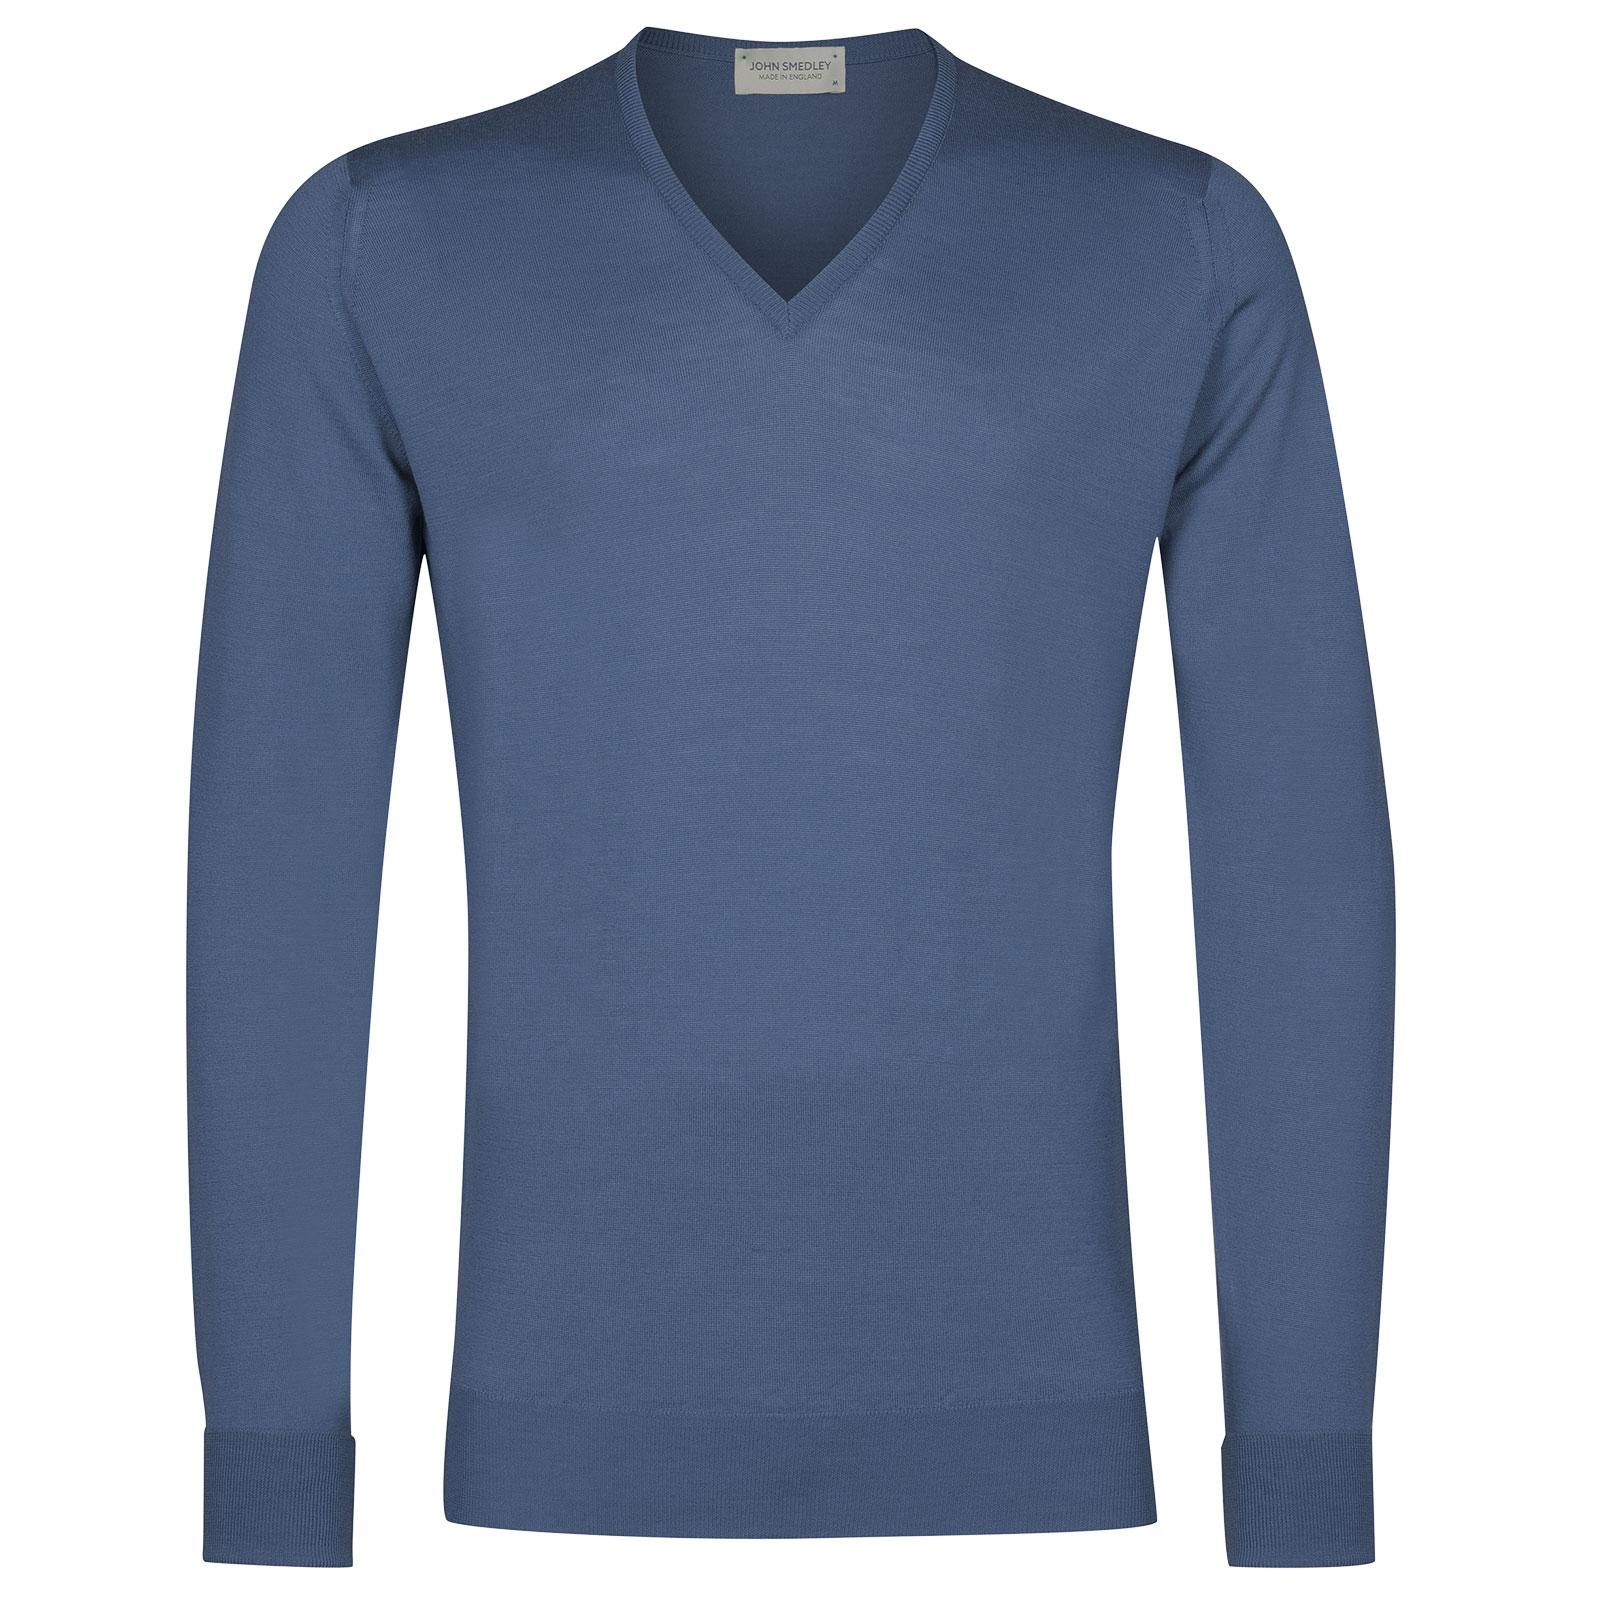 John Smedley Bobby in Blue Iris Pullover-XLG